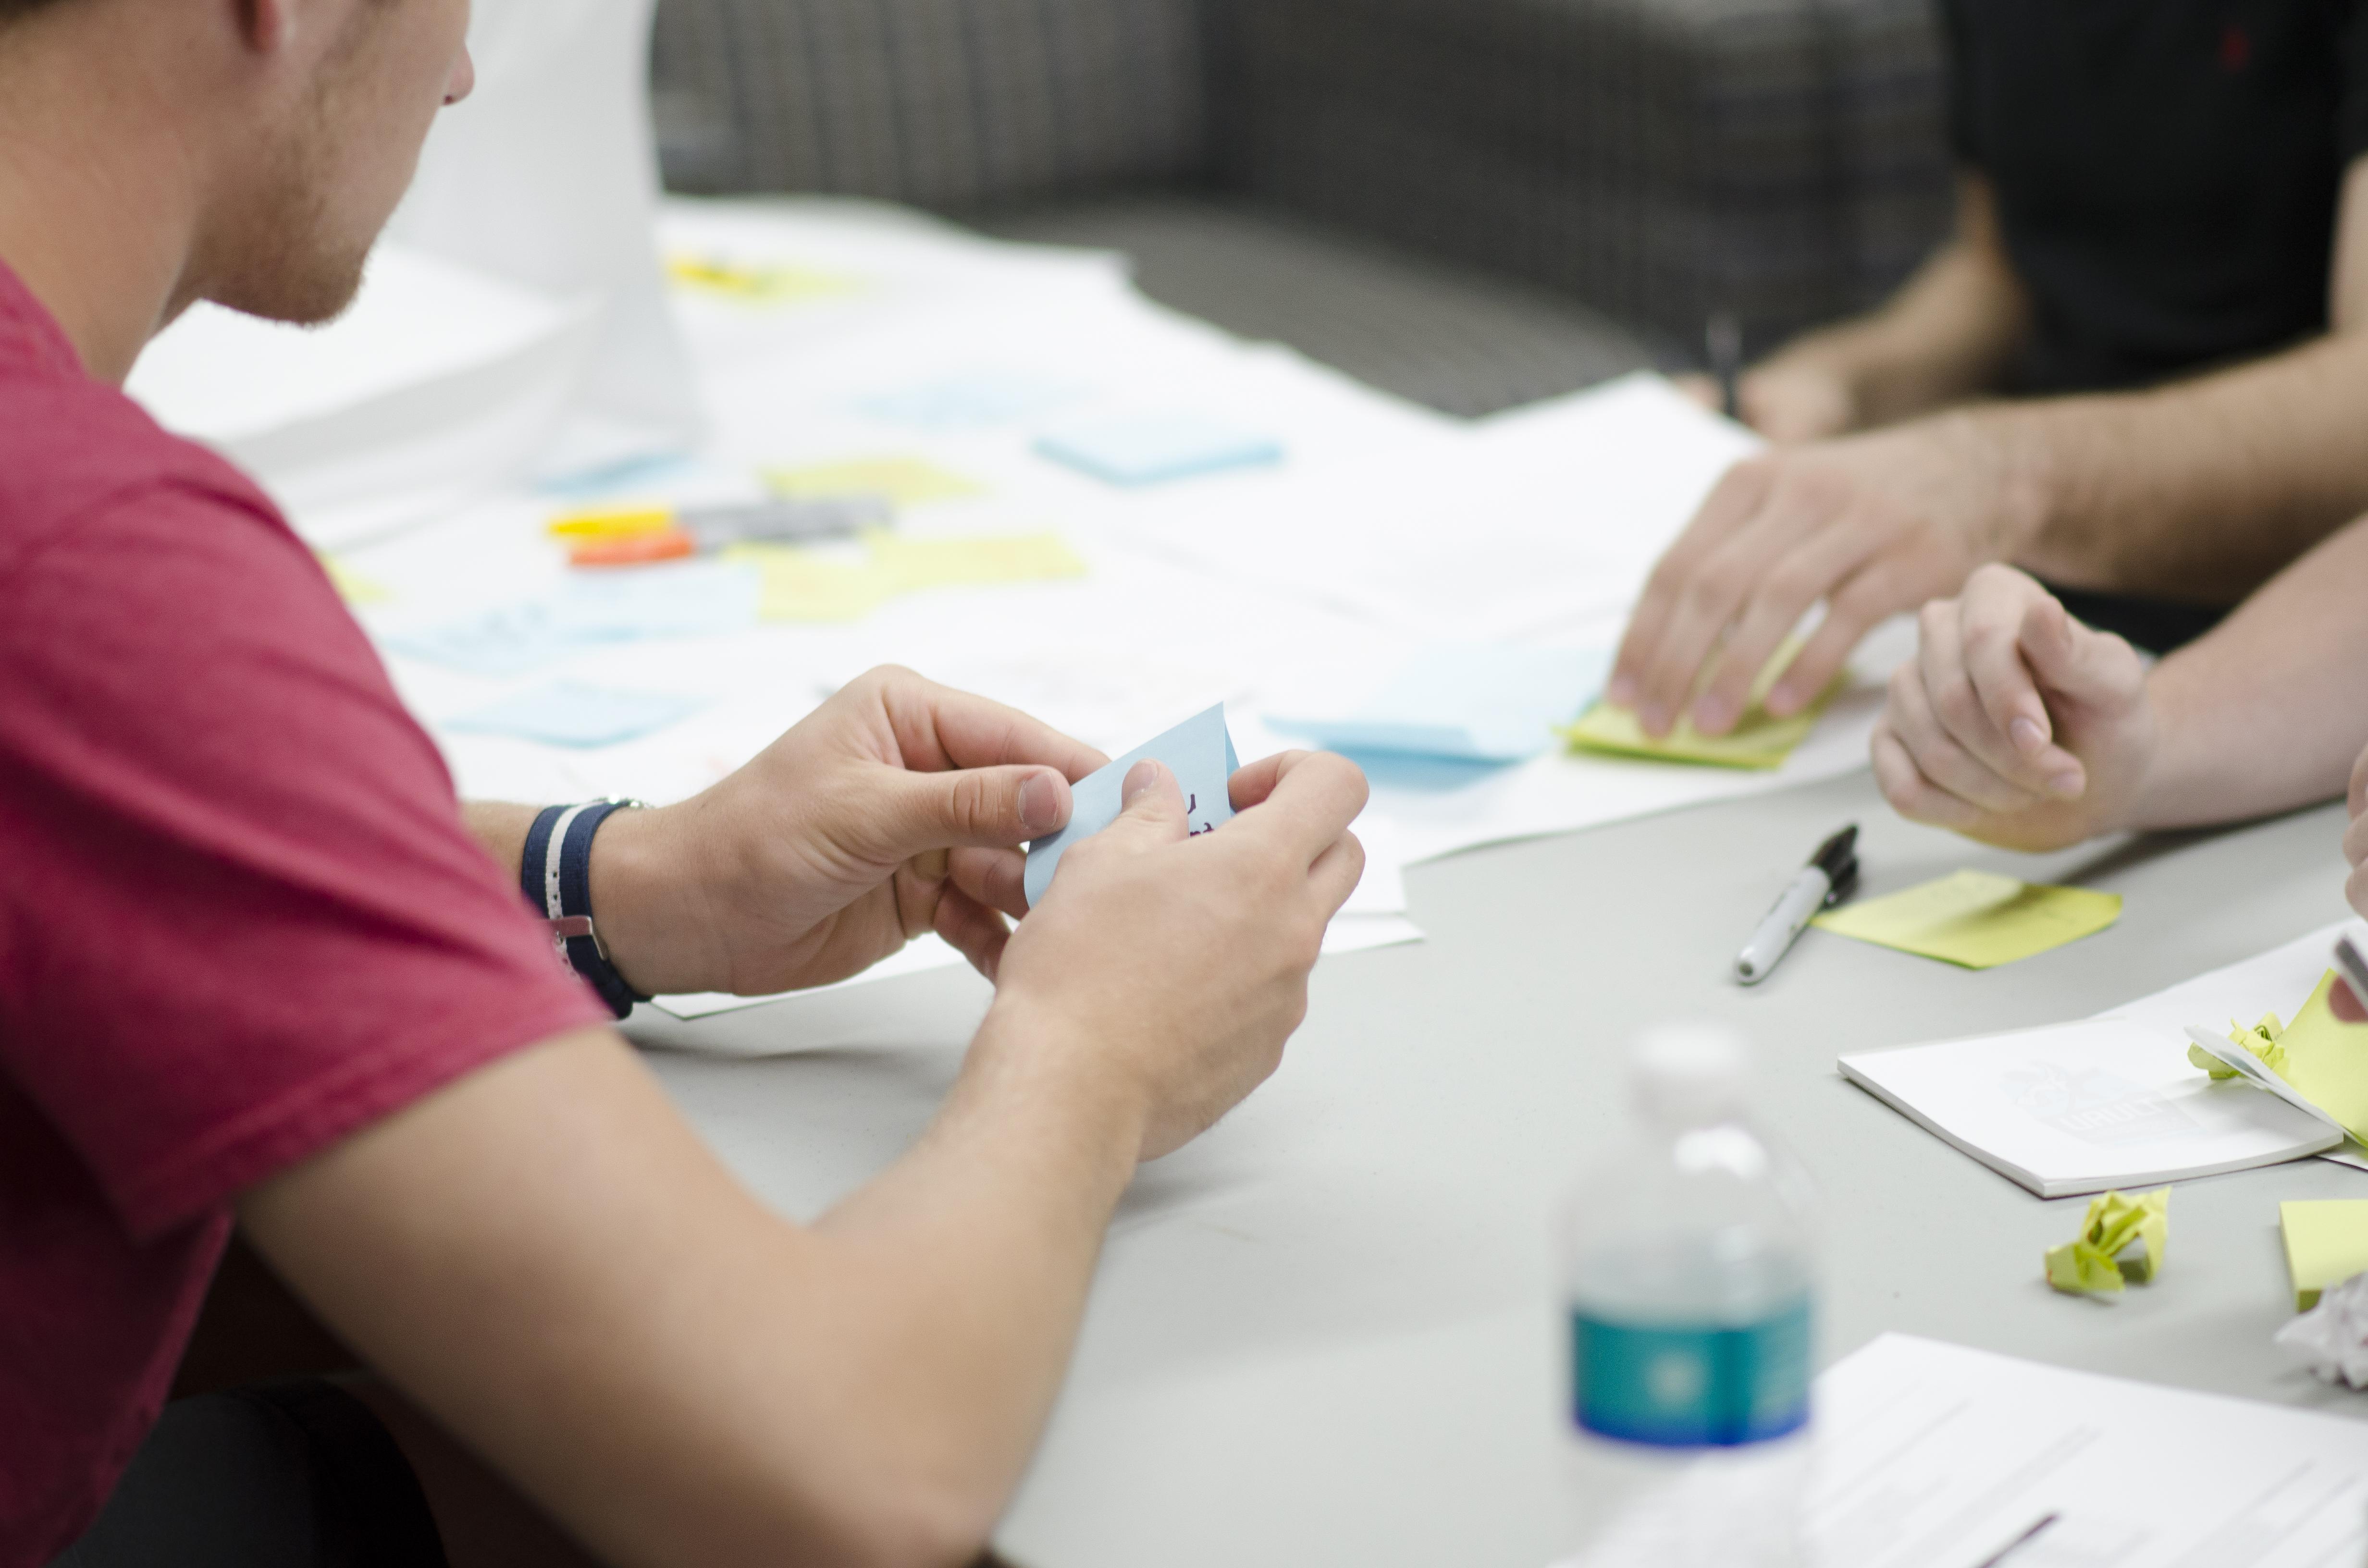 5 Best Kept Secrets About Startups